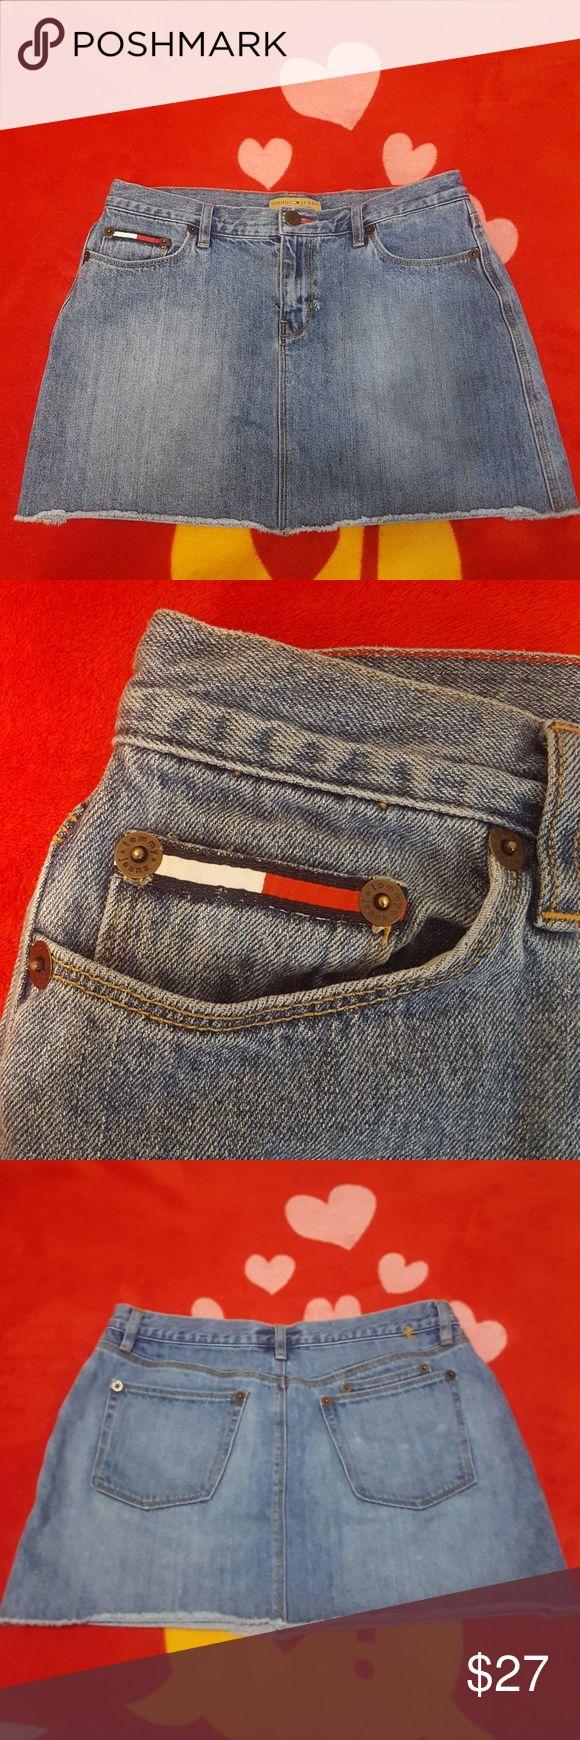 Tommy Hilfiger ~ Denim Skirt ~ Size 11 Cute 90s Tommy Hilfiger Jean Skirt frayed at the bottom Tommy Hilfiger Skirts Mini